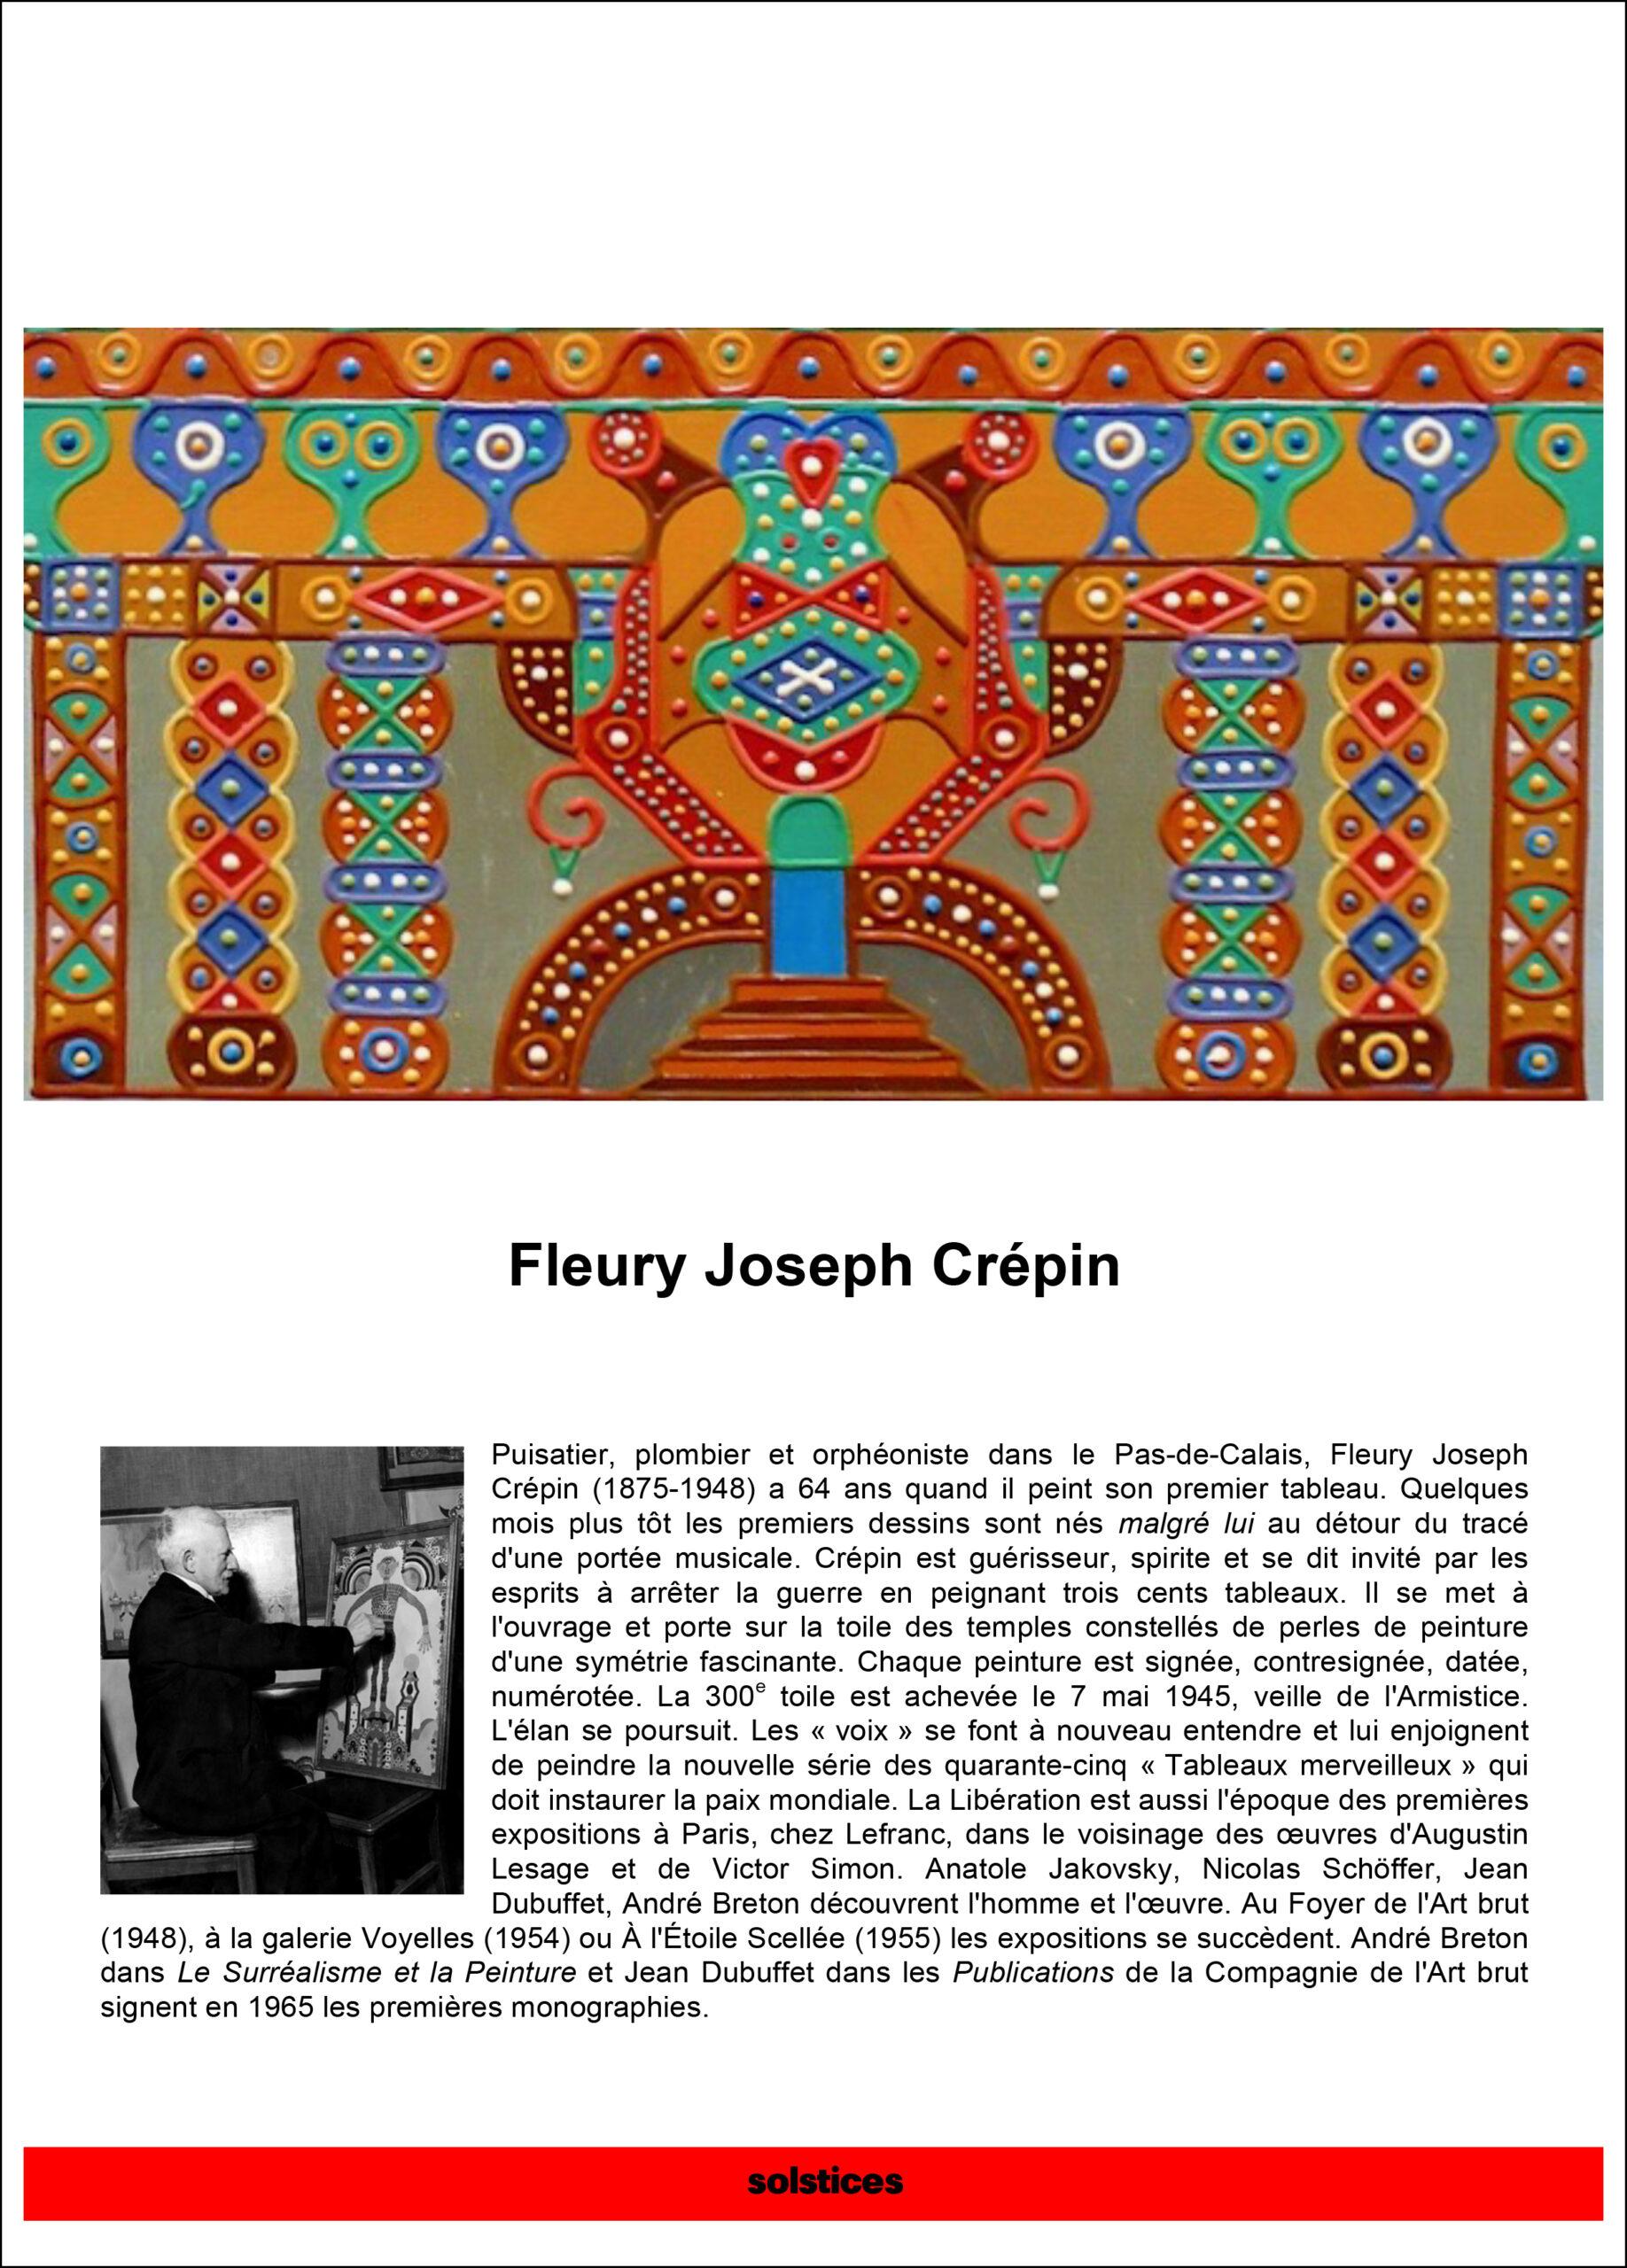 Fleury Joseph Crépin